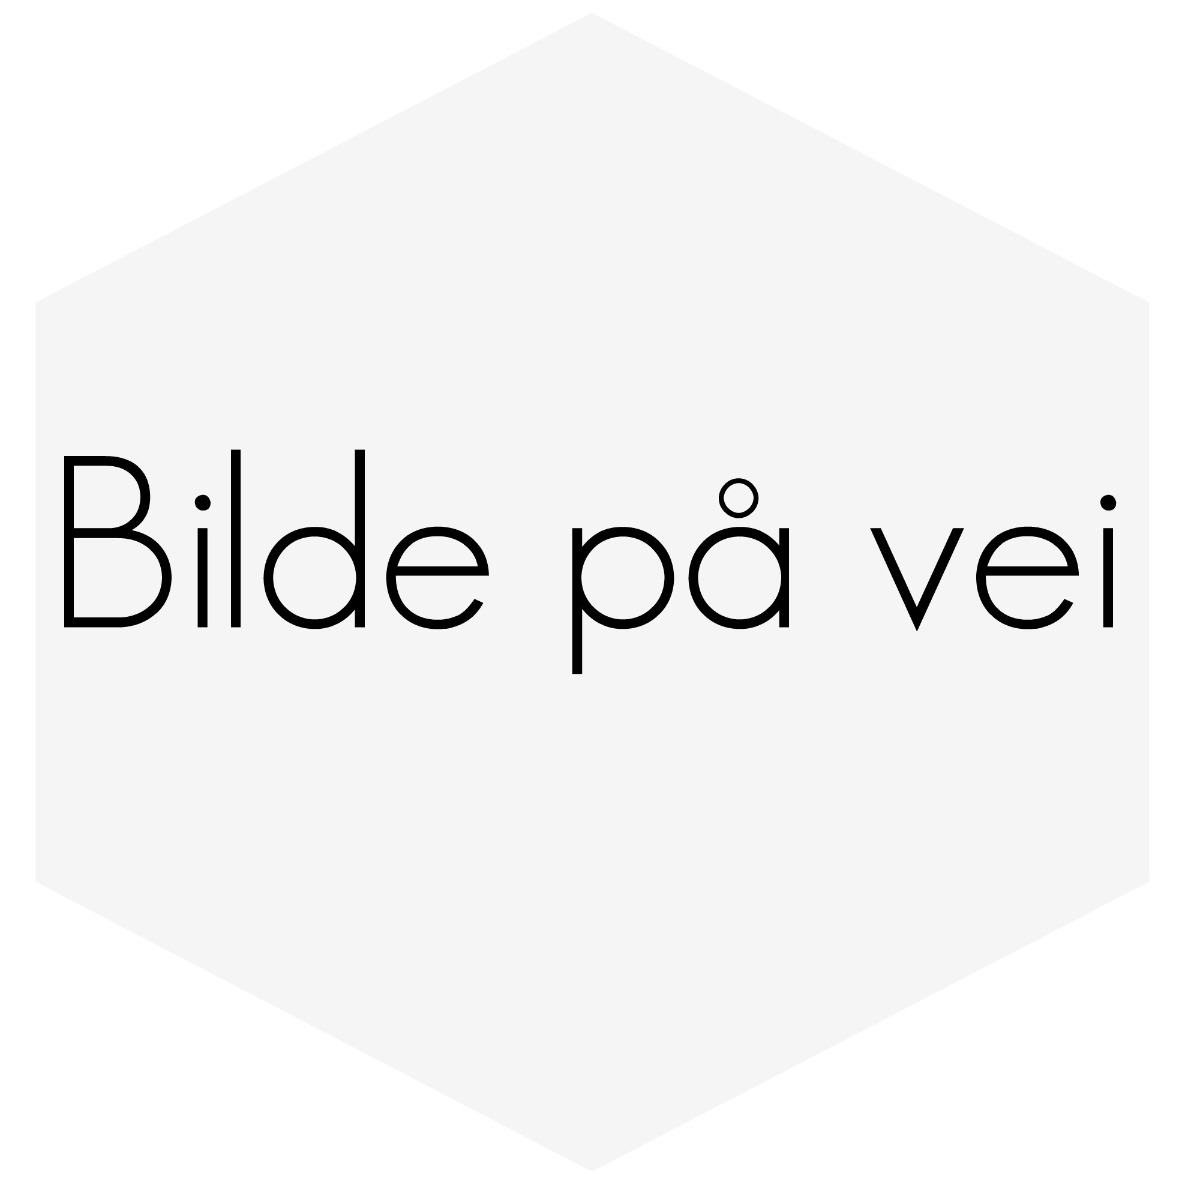 STYRESTAG YTRE VENSTRE SIDE VOLVO 100-69>.1206231